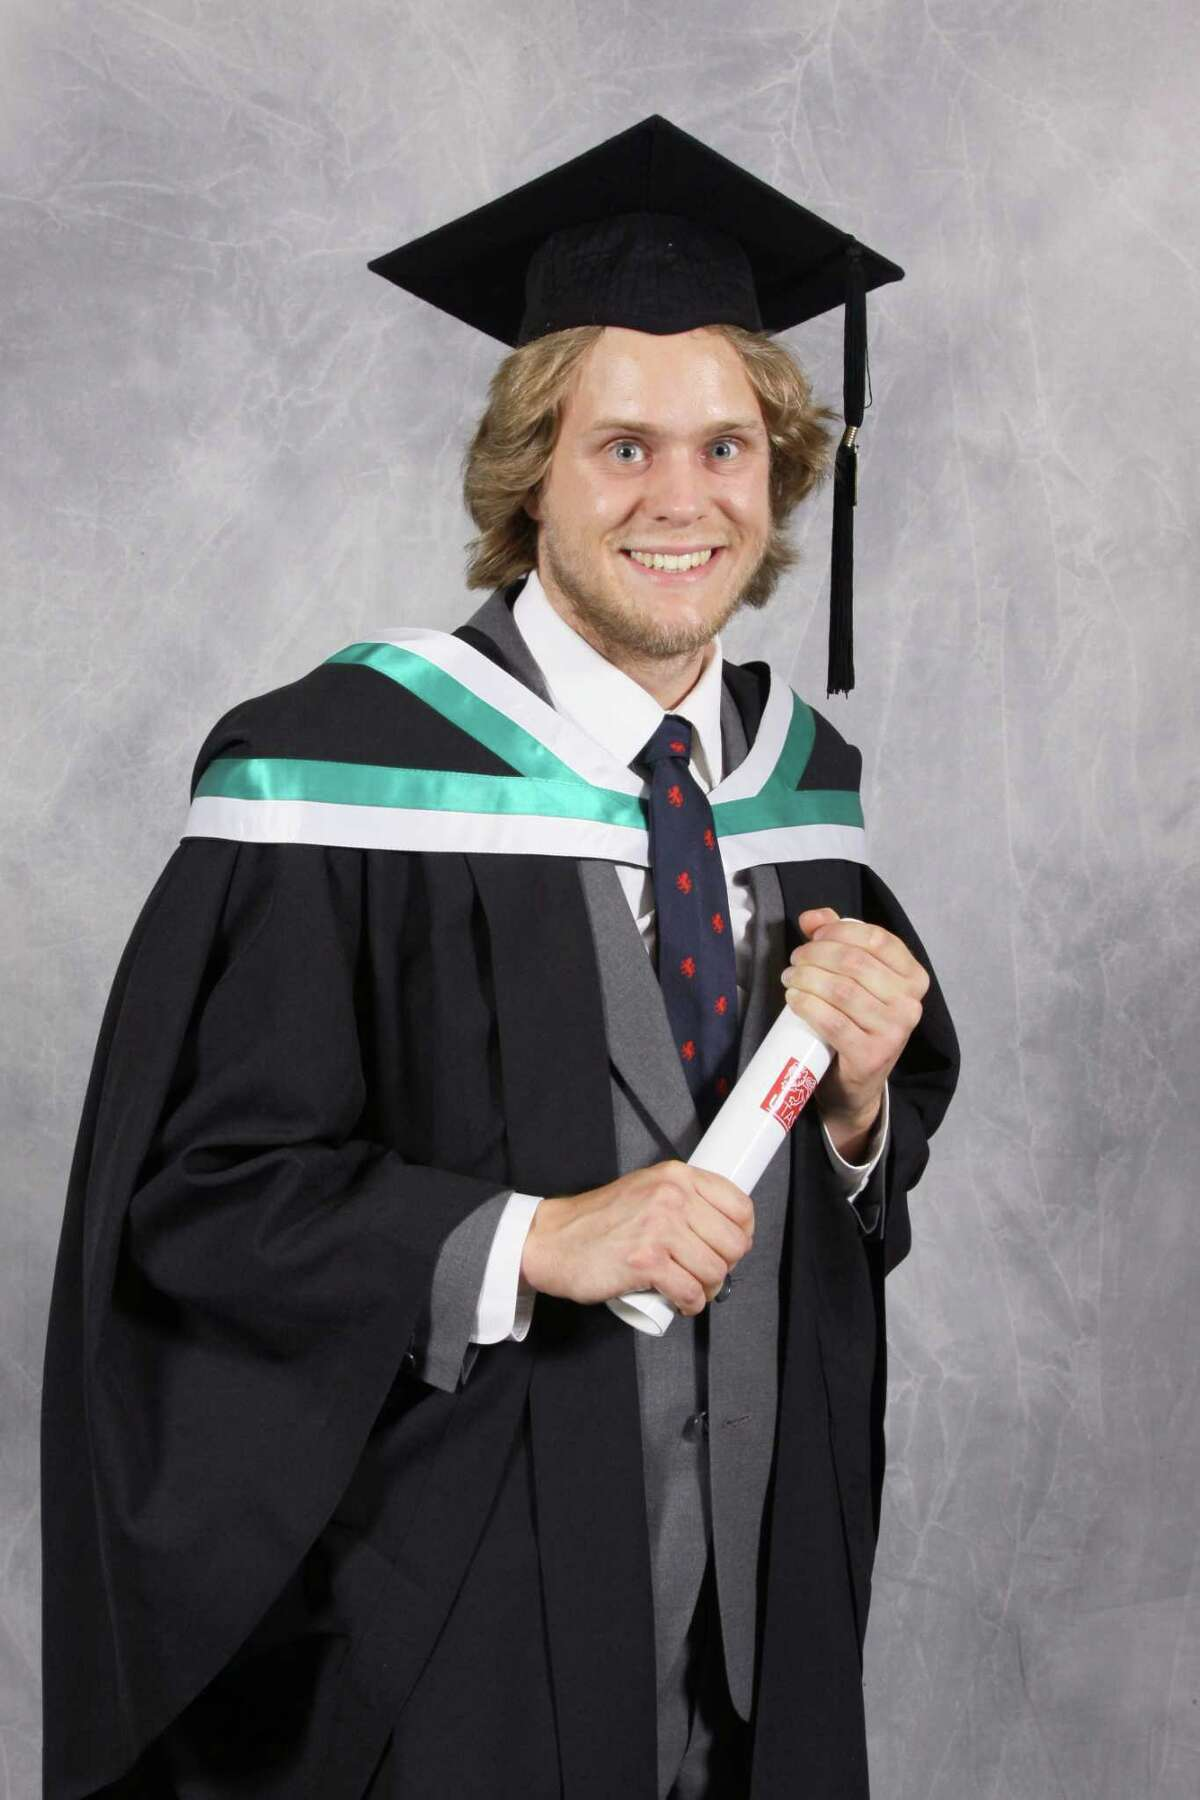 Nicholas Letchford at his graduation. (Provided)